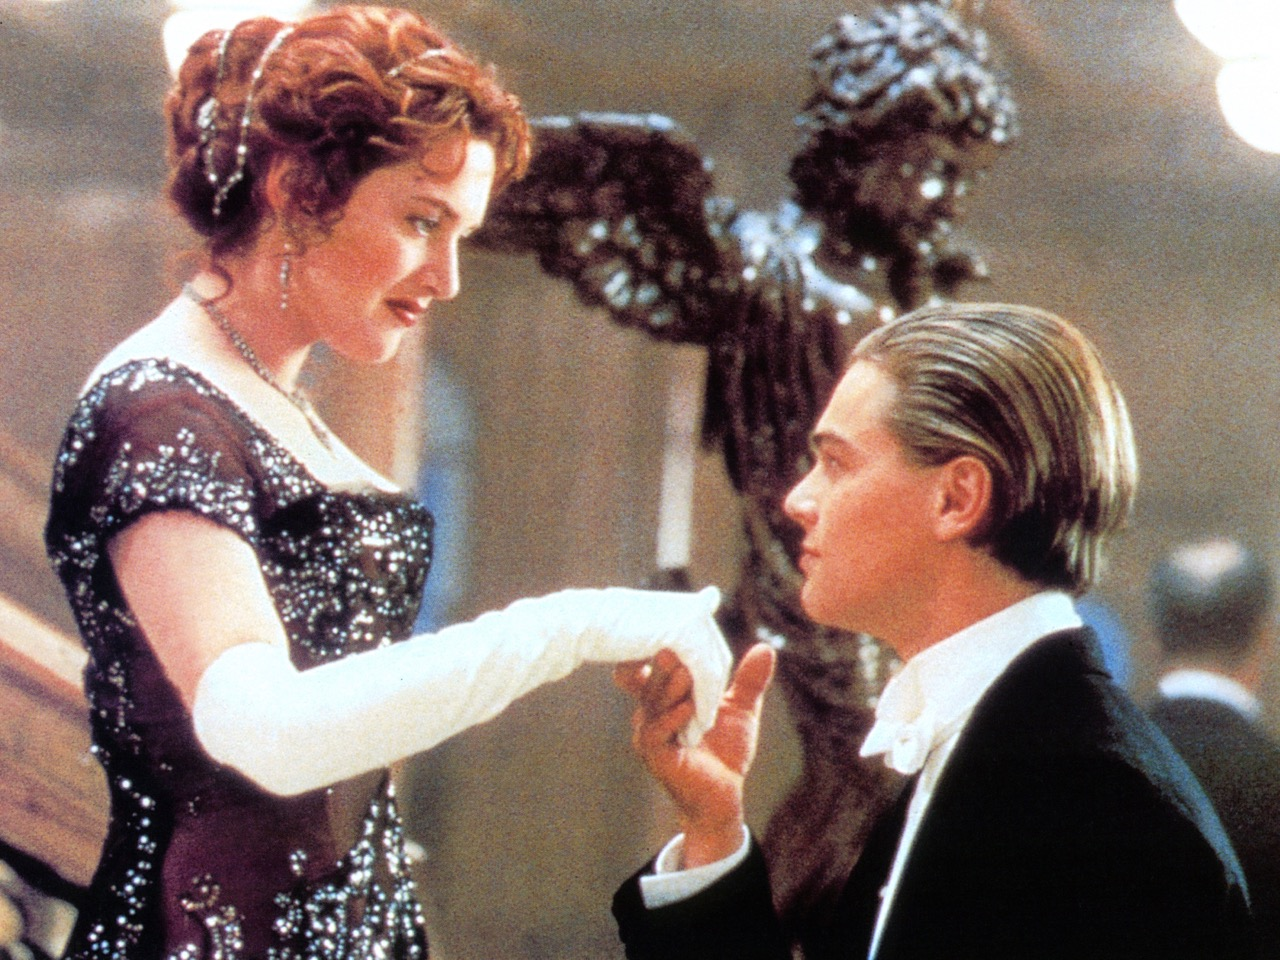 Kate Winslet And Leonardo DiCaprio In 'Titanic'